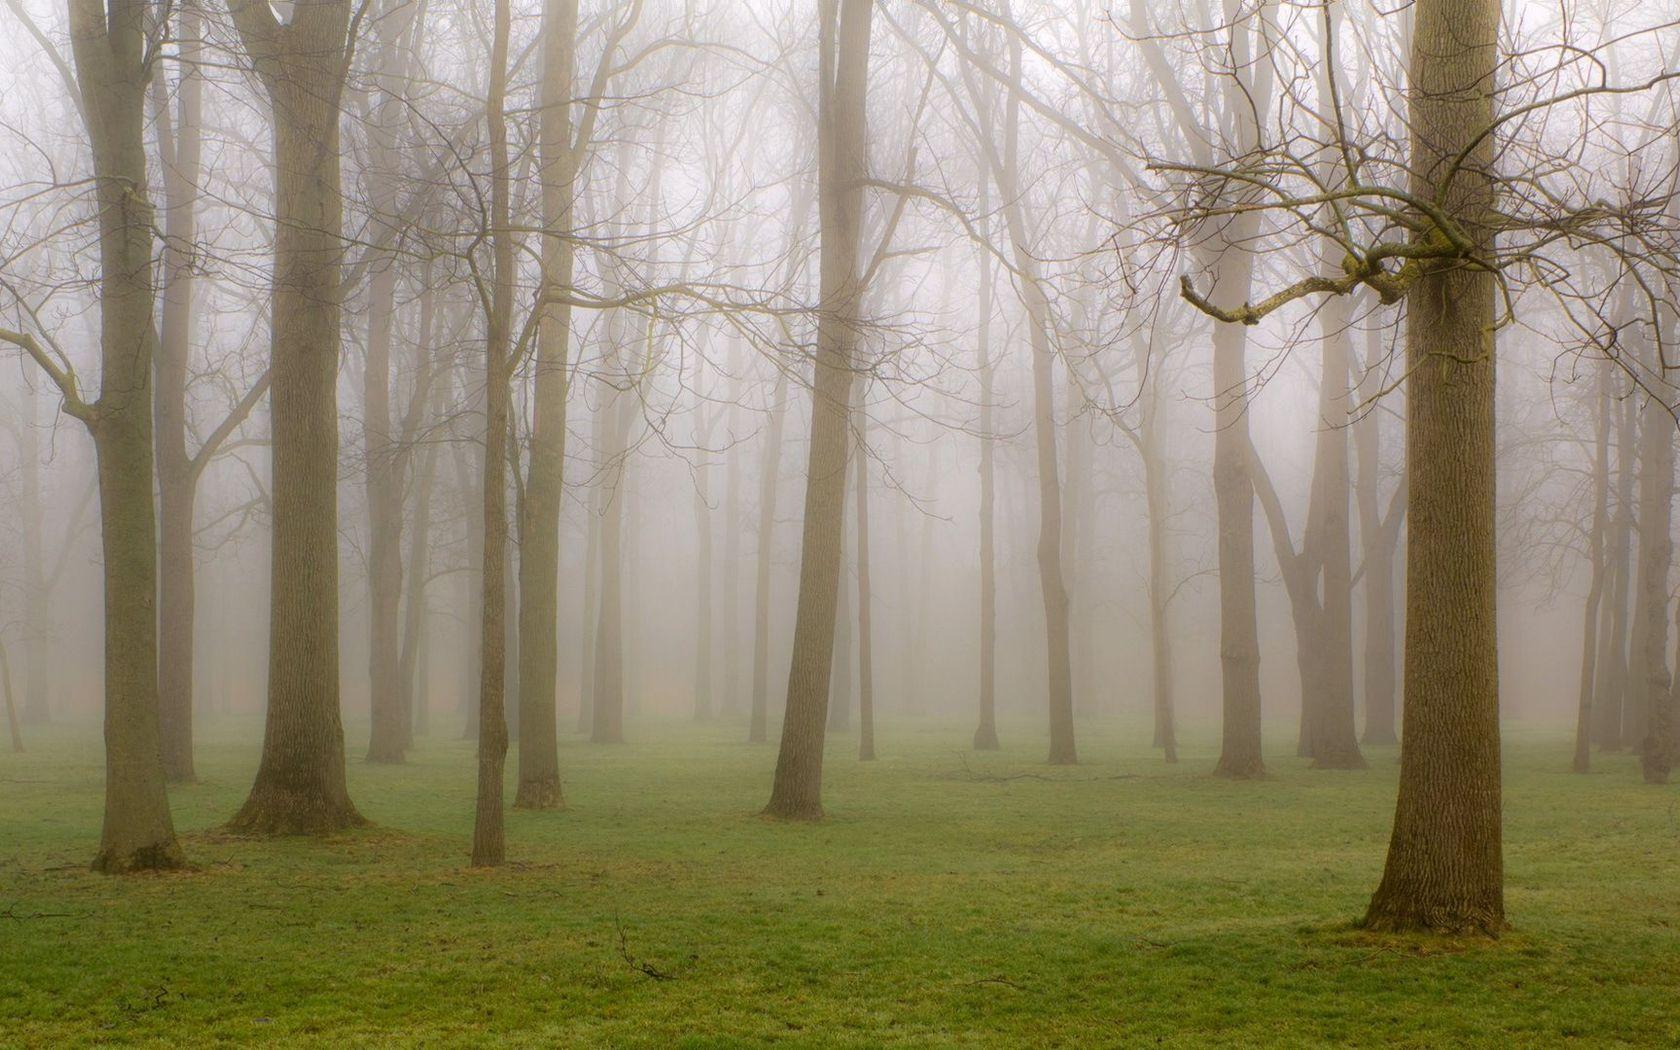 Foggy forest wallpaper 20485 1680x1050